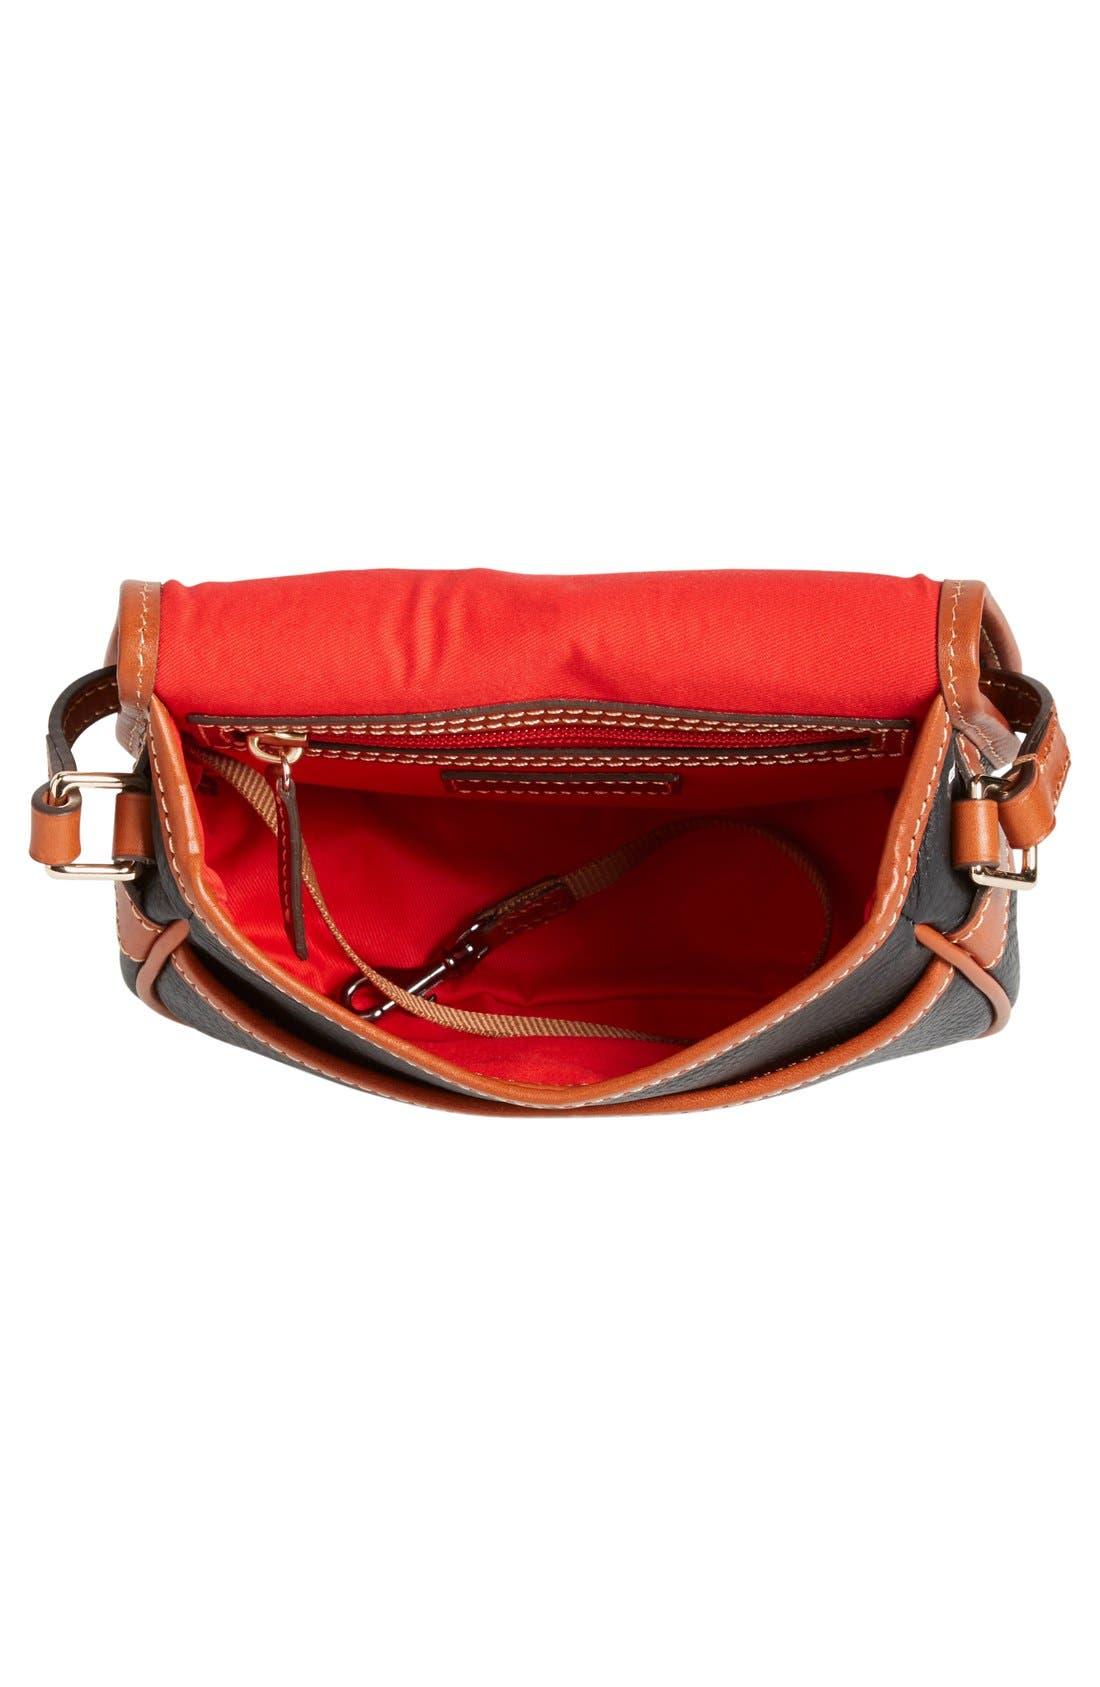 'Hallie' Leather Crossbody Bag,                             Alternate thumbnail 4, color,                             001